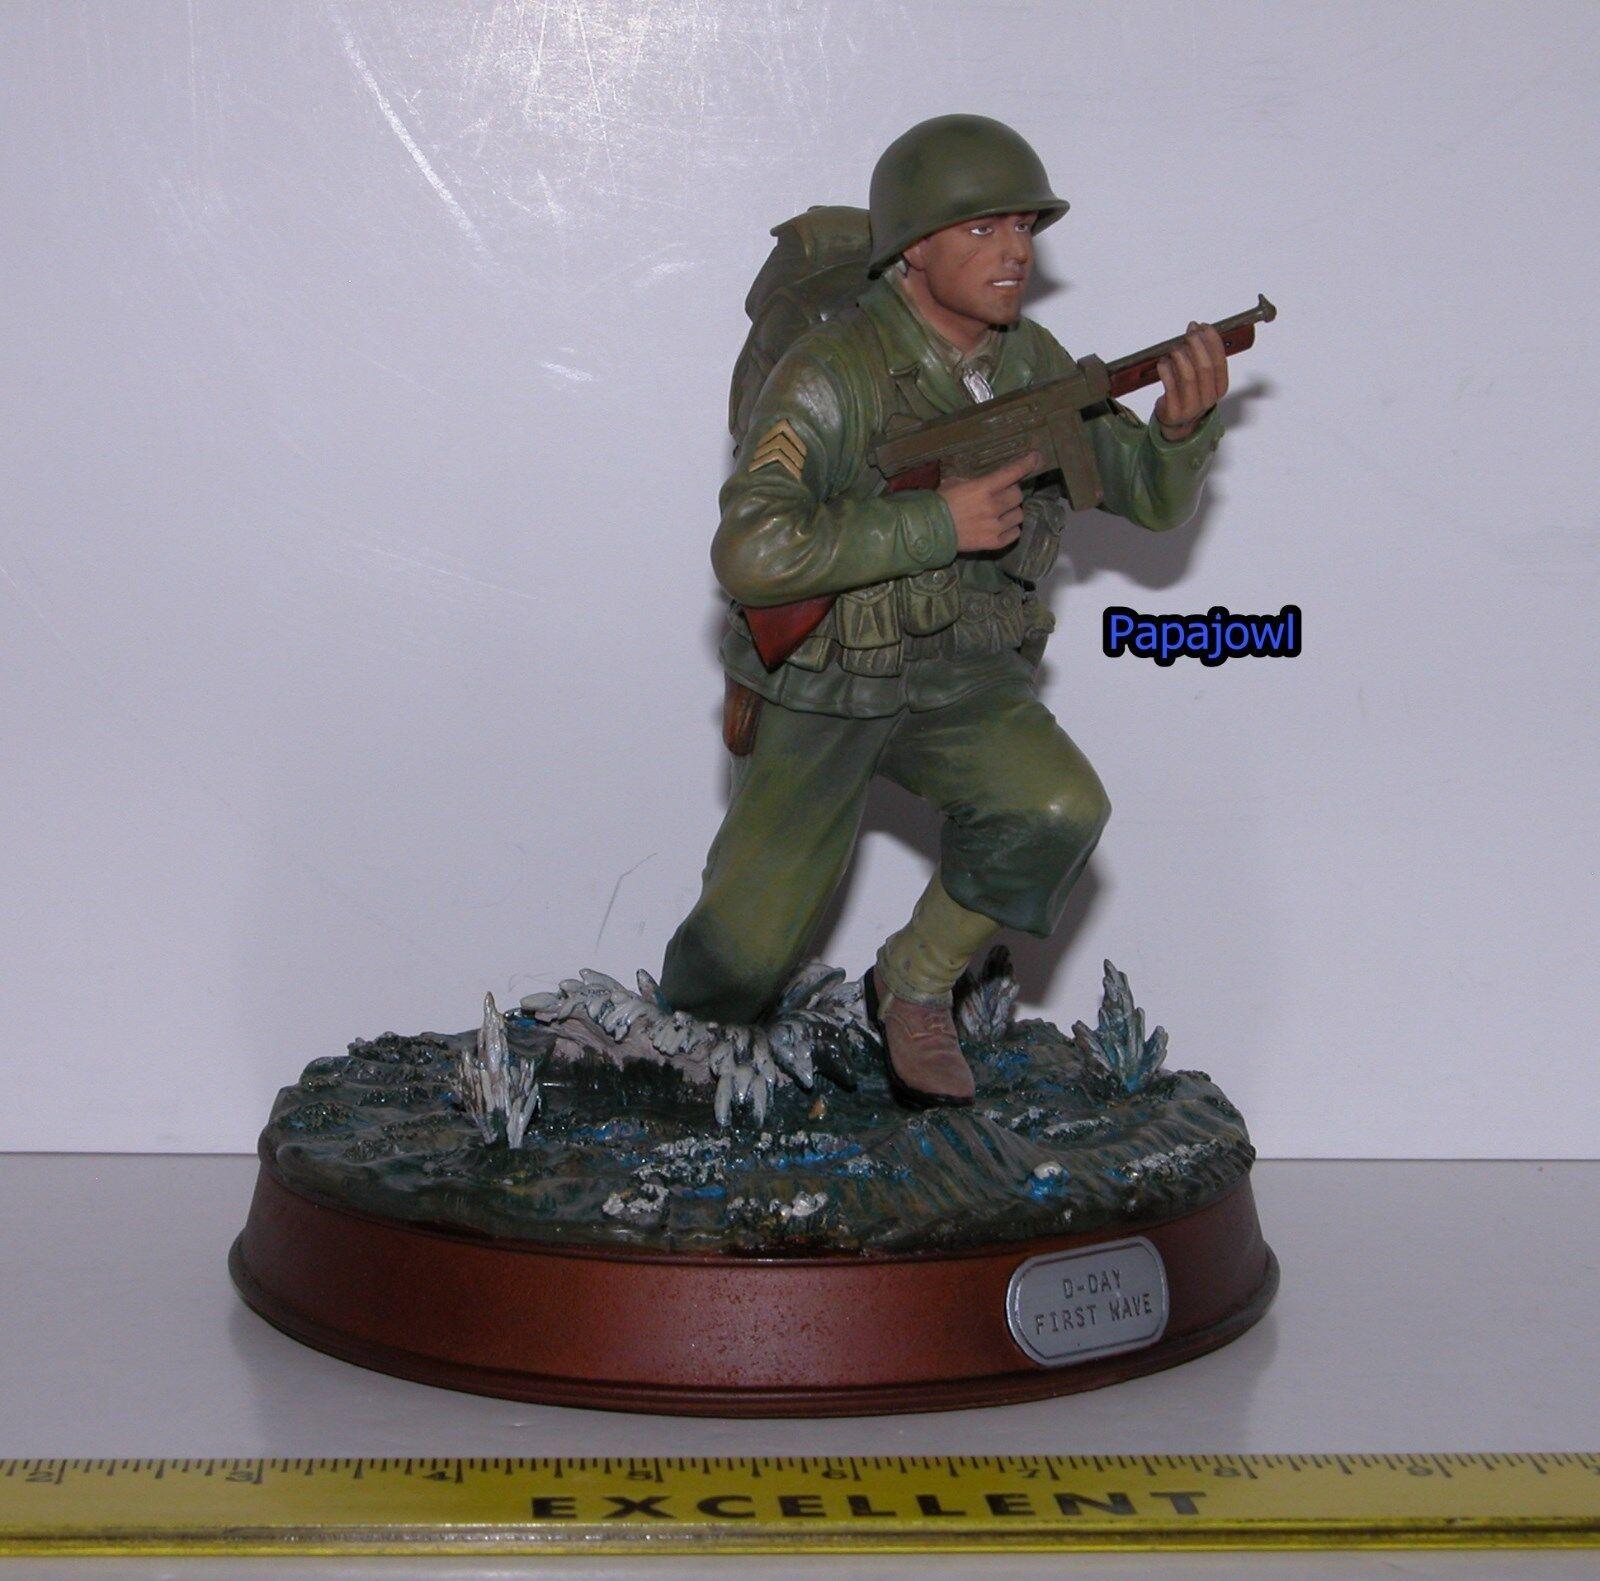 GI Joe Unique Display Piece Military Metal Series D-Day First Wave Hasbro 2000